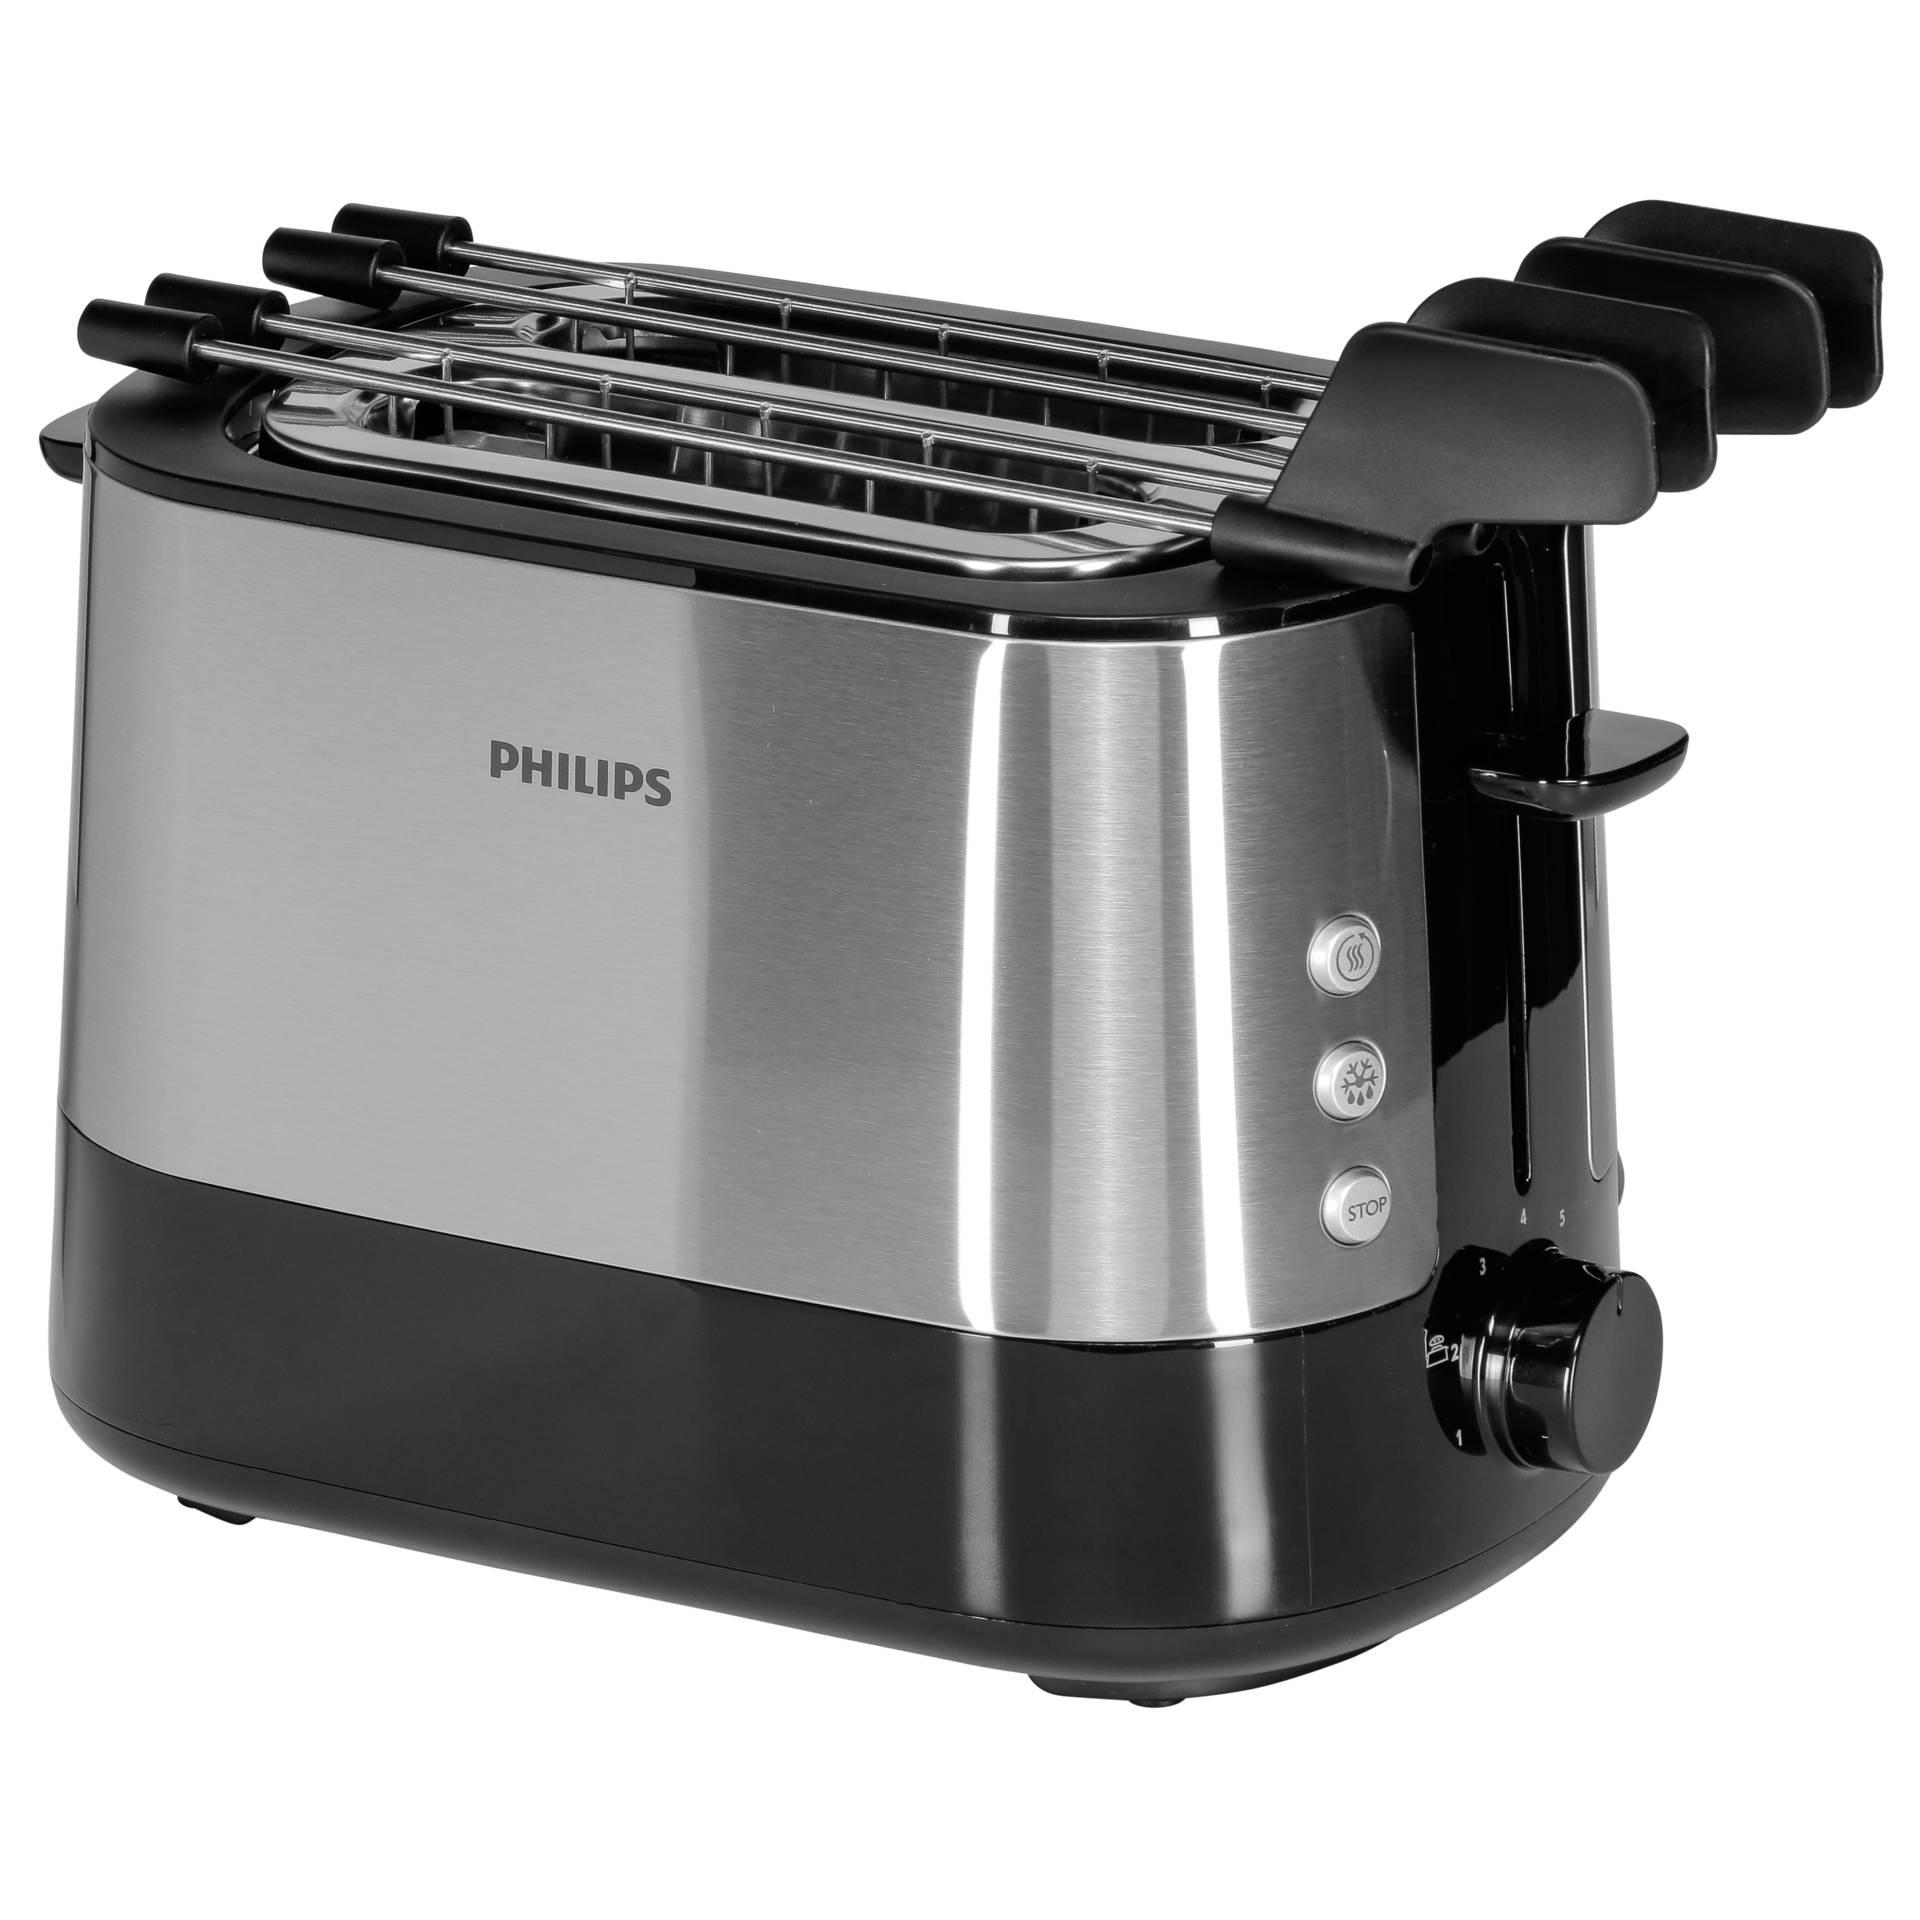 Philips HD 2639/90